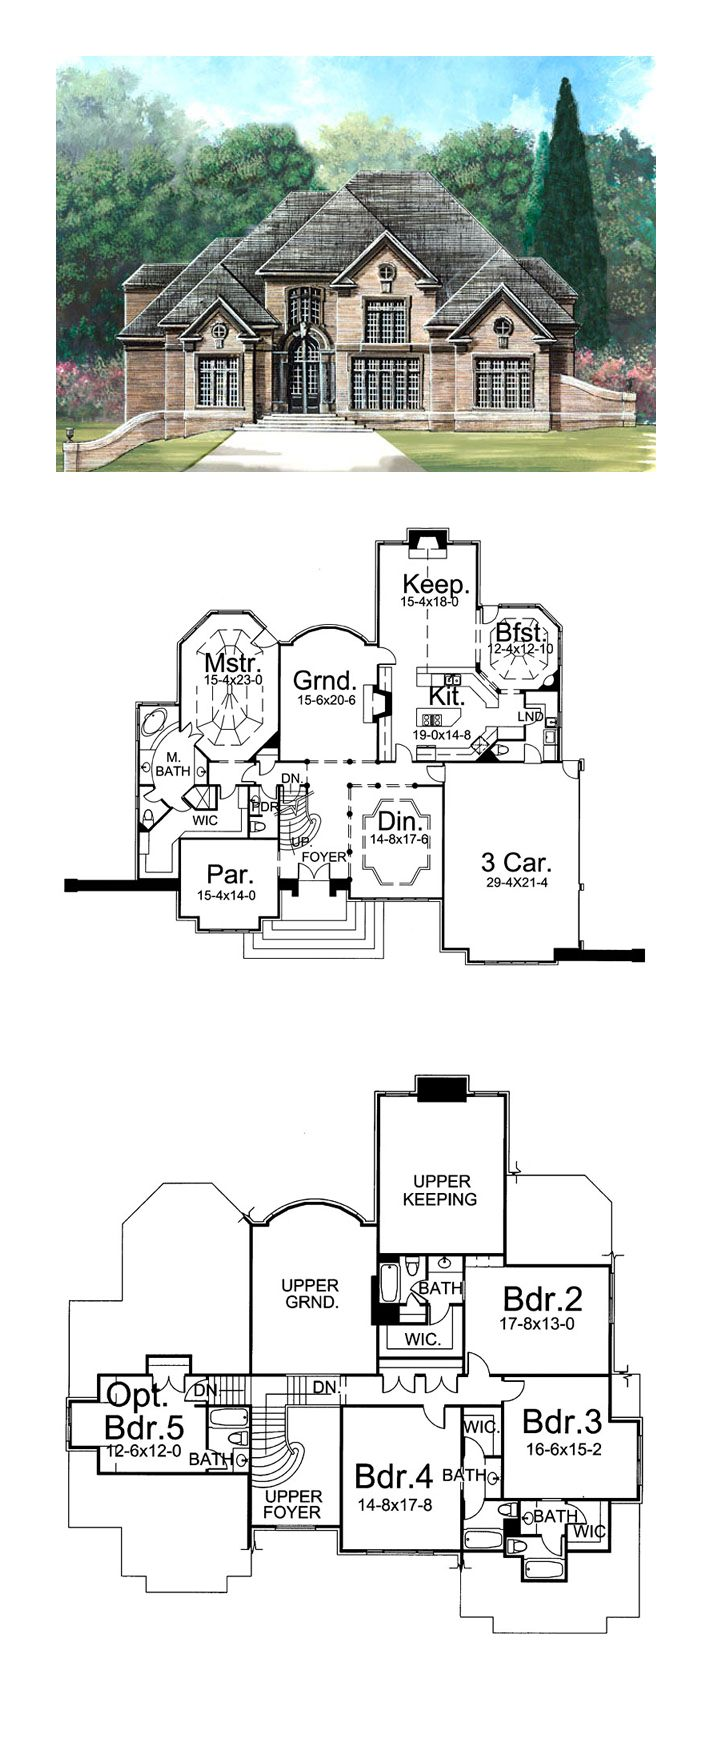 Greek Revival House Plan 72027   Total Living Area: 4195 sq. ft., 4 bedrooms and 4.2 bathrooms. #greekrevivalhome